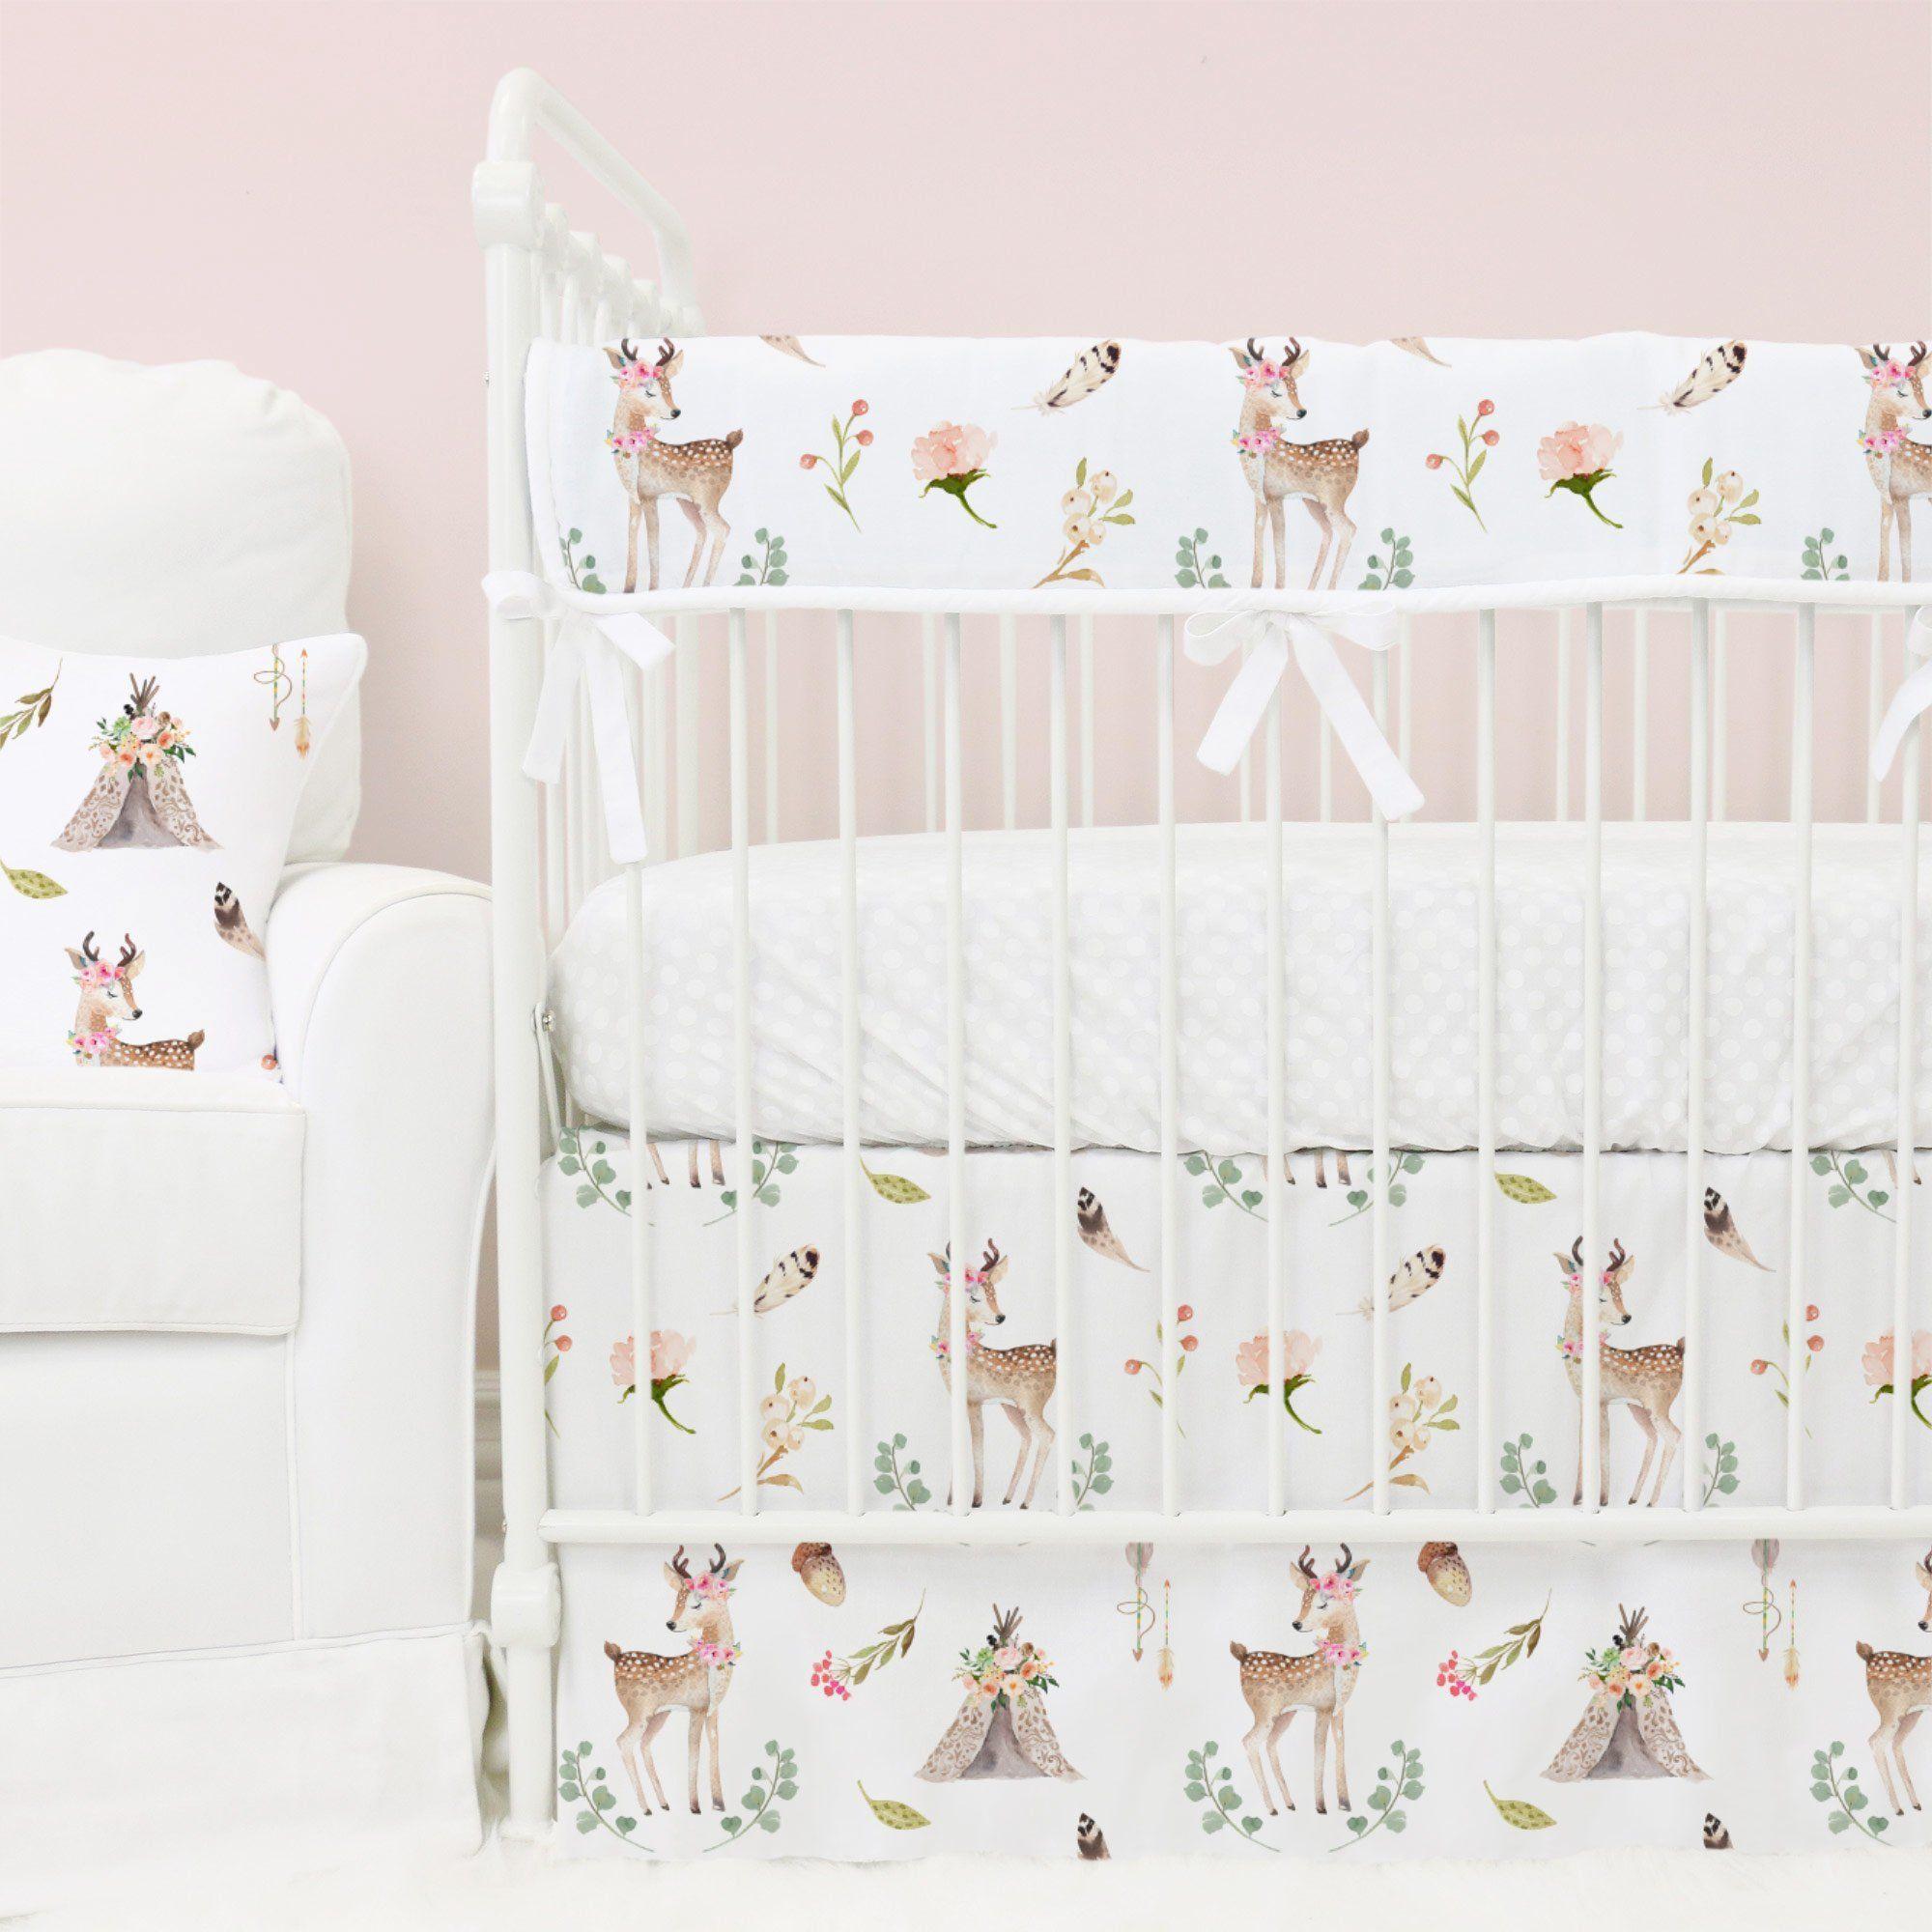 Blakely S Boho Woodland Deer Nursery Bedding Crib Bedding Girl Woodland Nursery Girl Deer Nursery Bedding